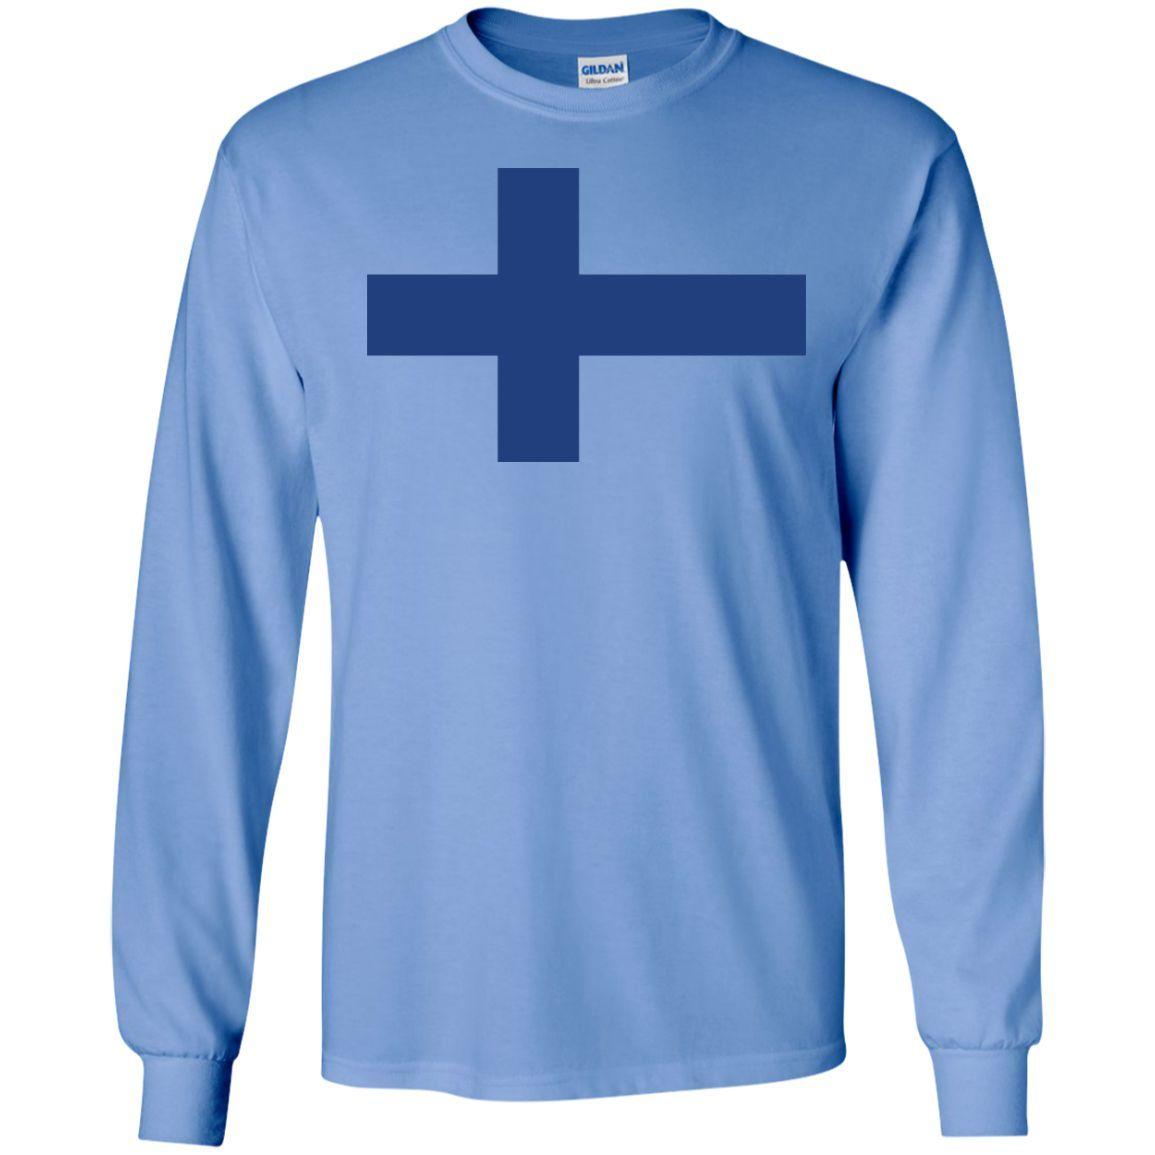 Finland flag t shirt 1-01 LS Ultra Cotton Tshirt